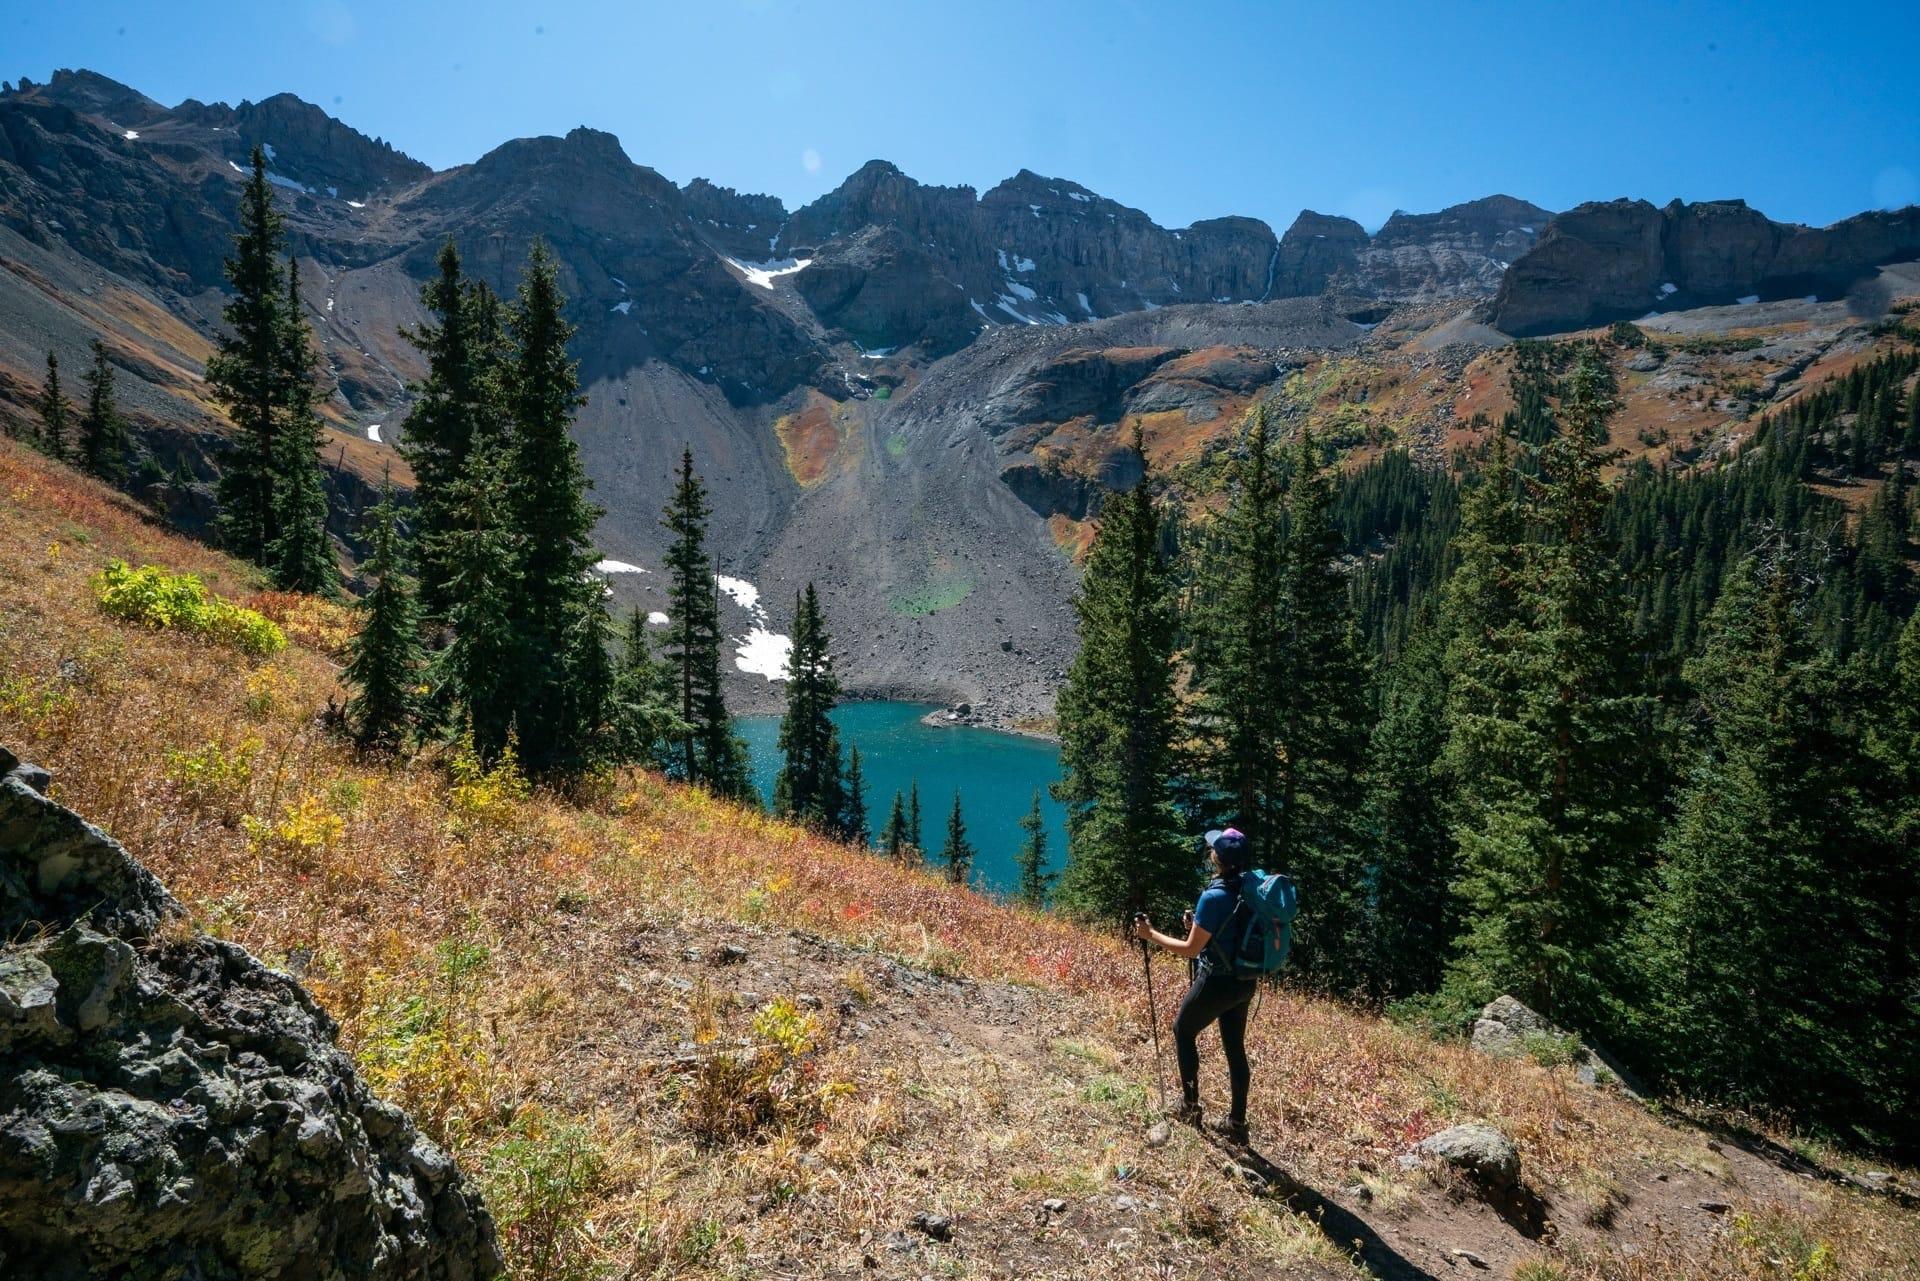 Colorado Road Trip: 15 Best Stops for Outdoor Adventure